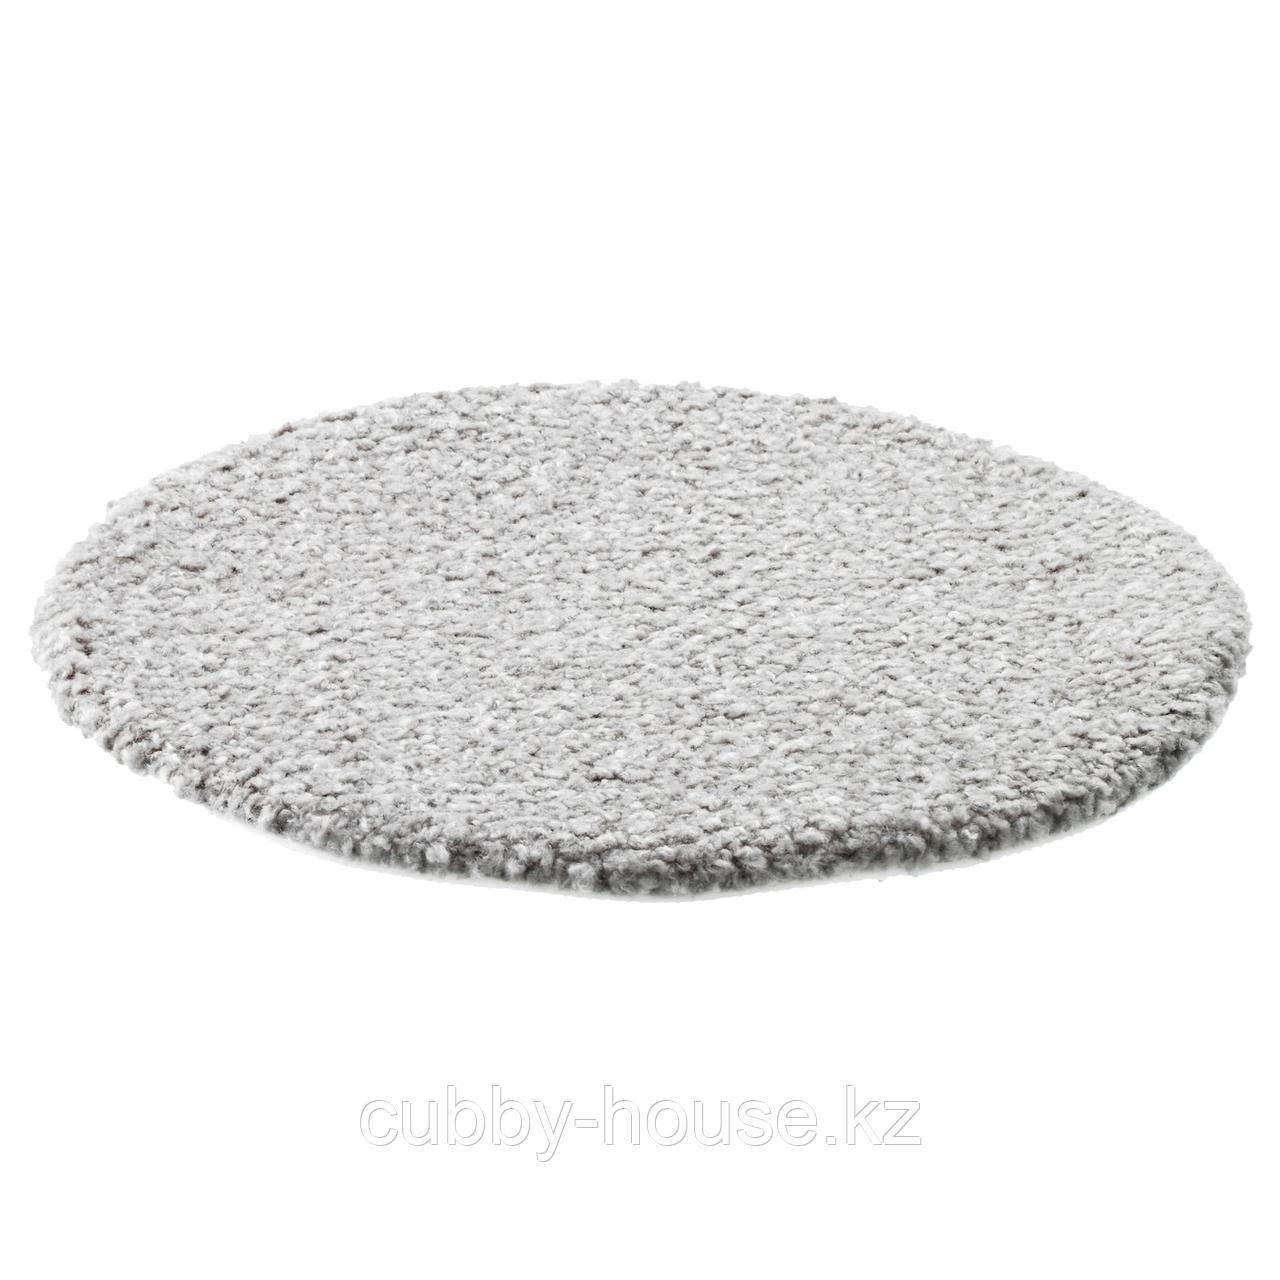 БЕРТИЛЬ Подушка на стул, серый, 33 см - фото 1